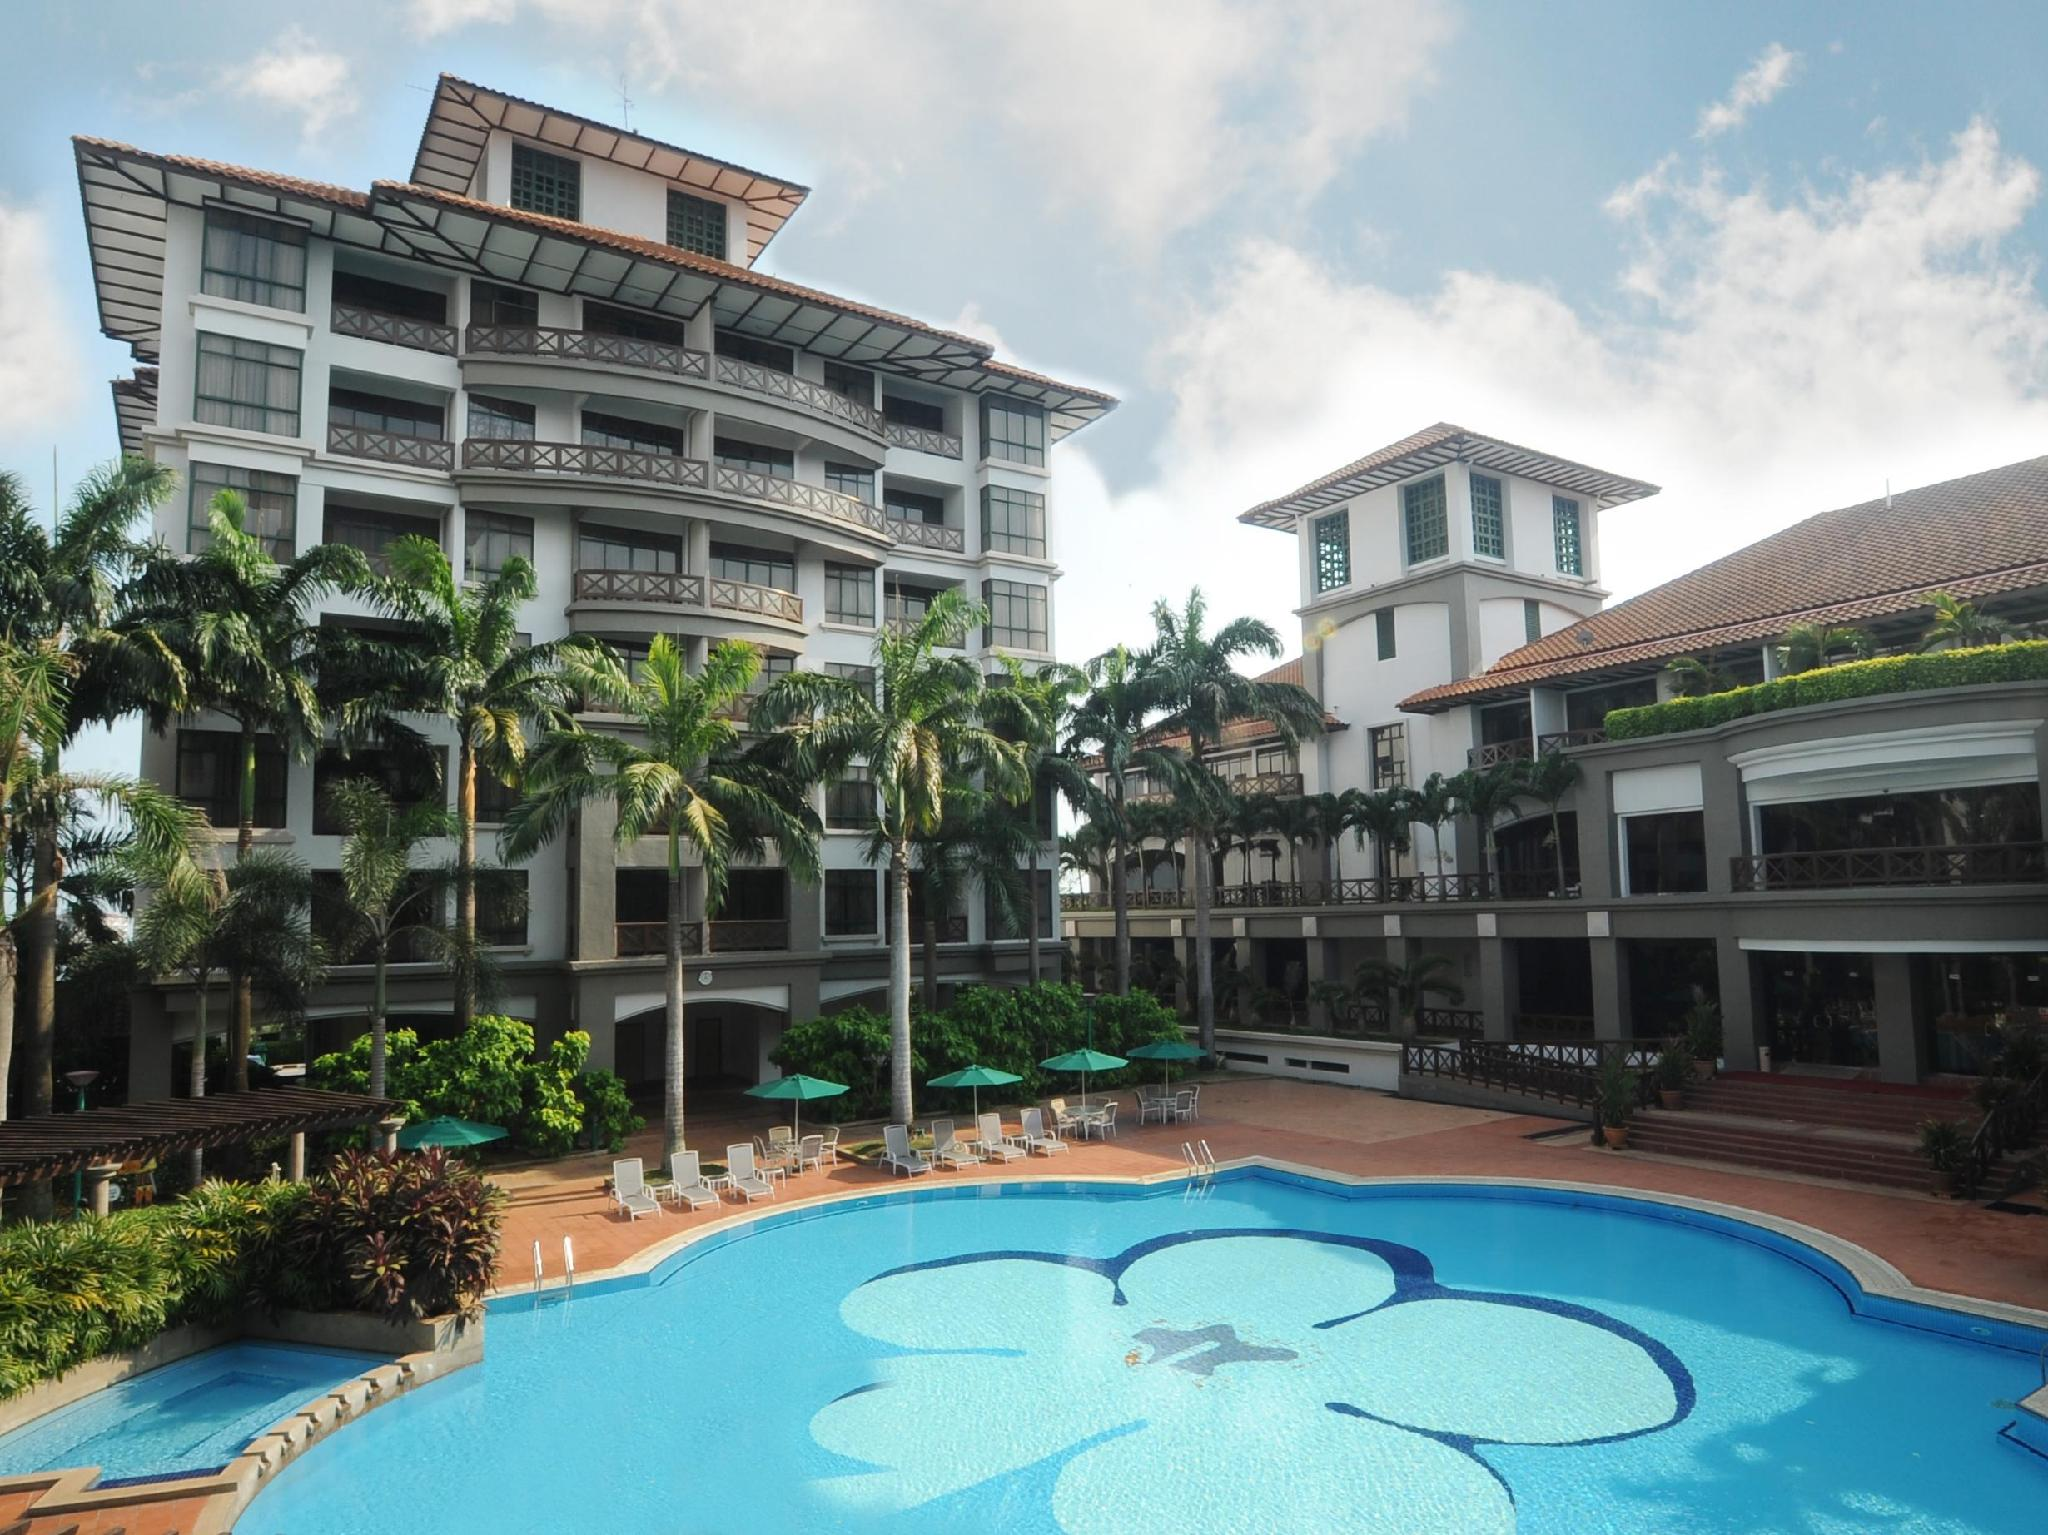 Mahkota Hotel Melaka - Hotels and Accommodation in Malaysia, Asia